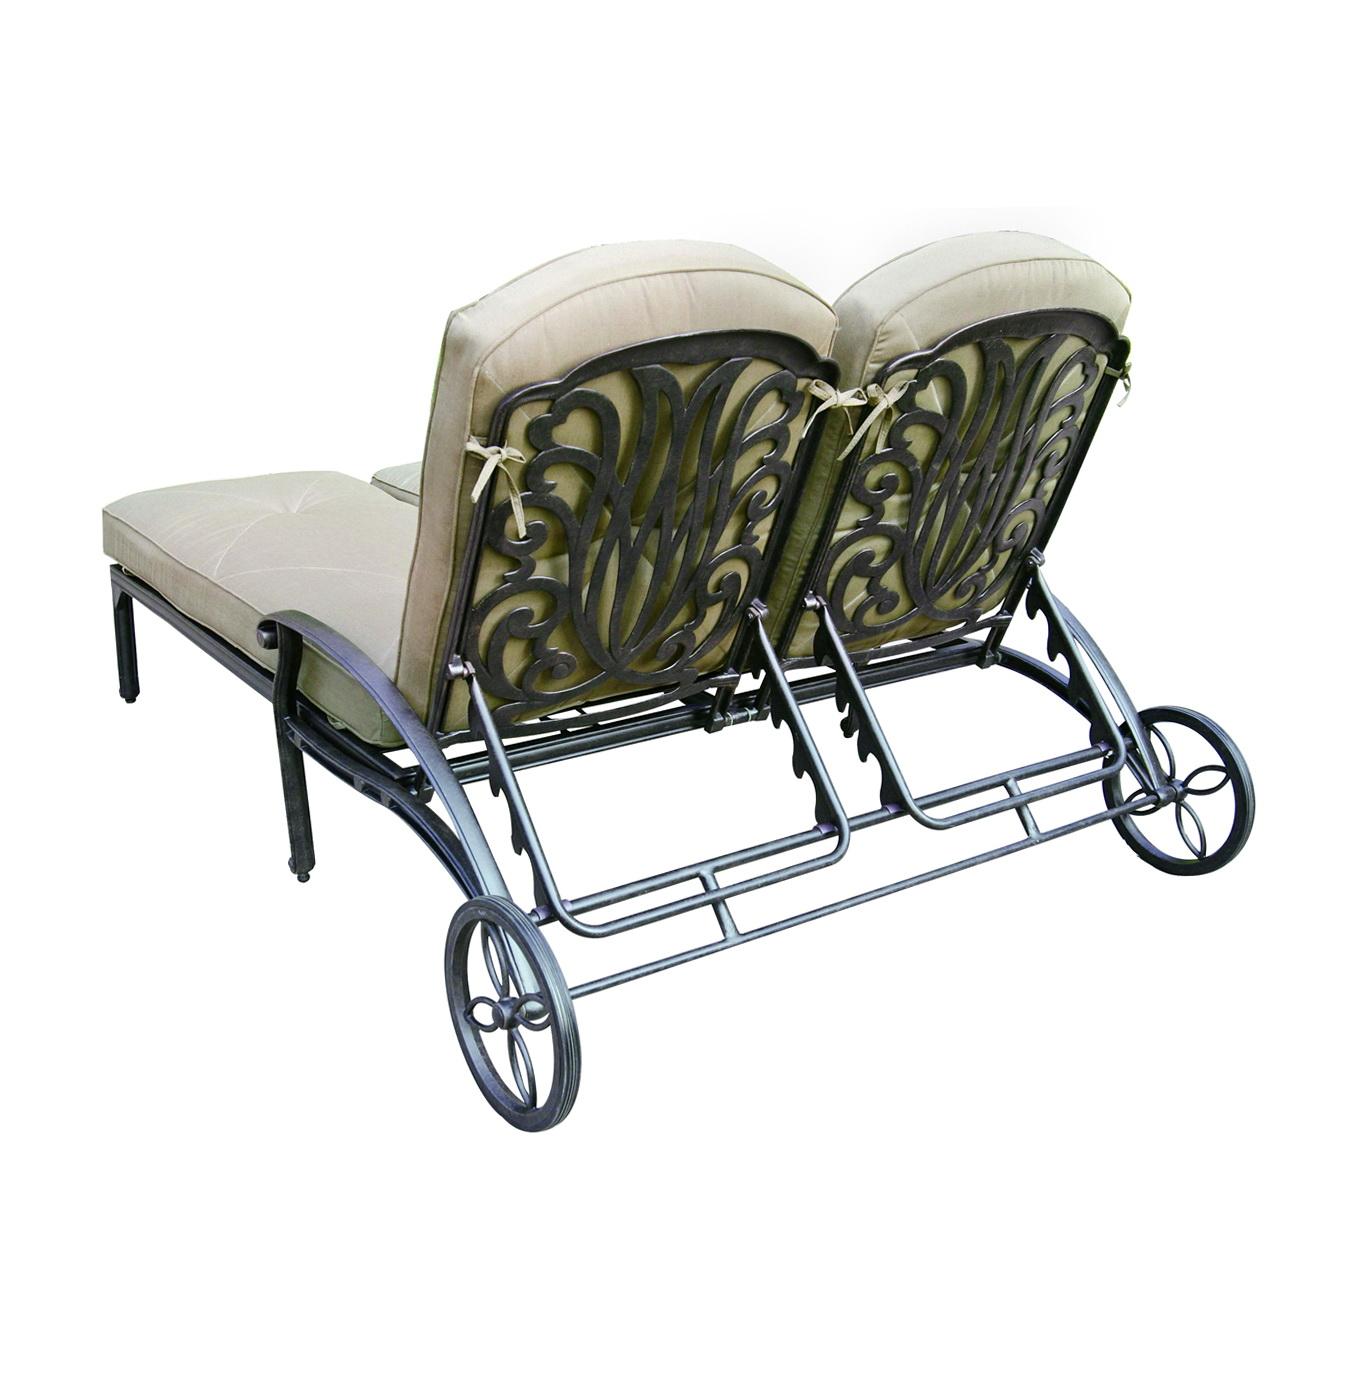 Double Chaise Lounge Cushions Walmart